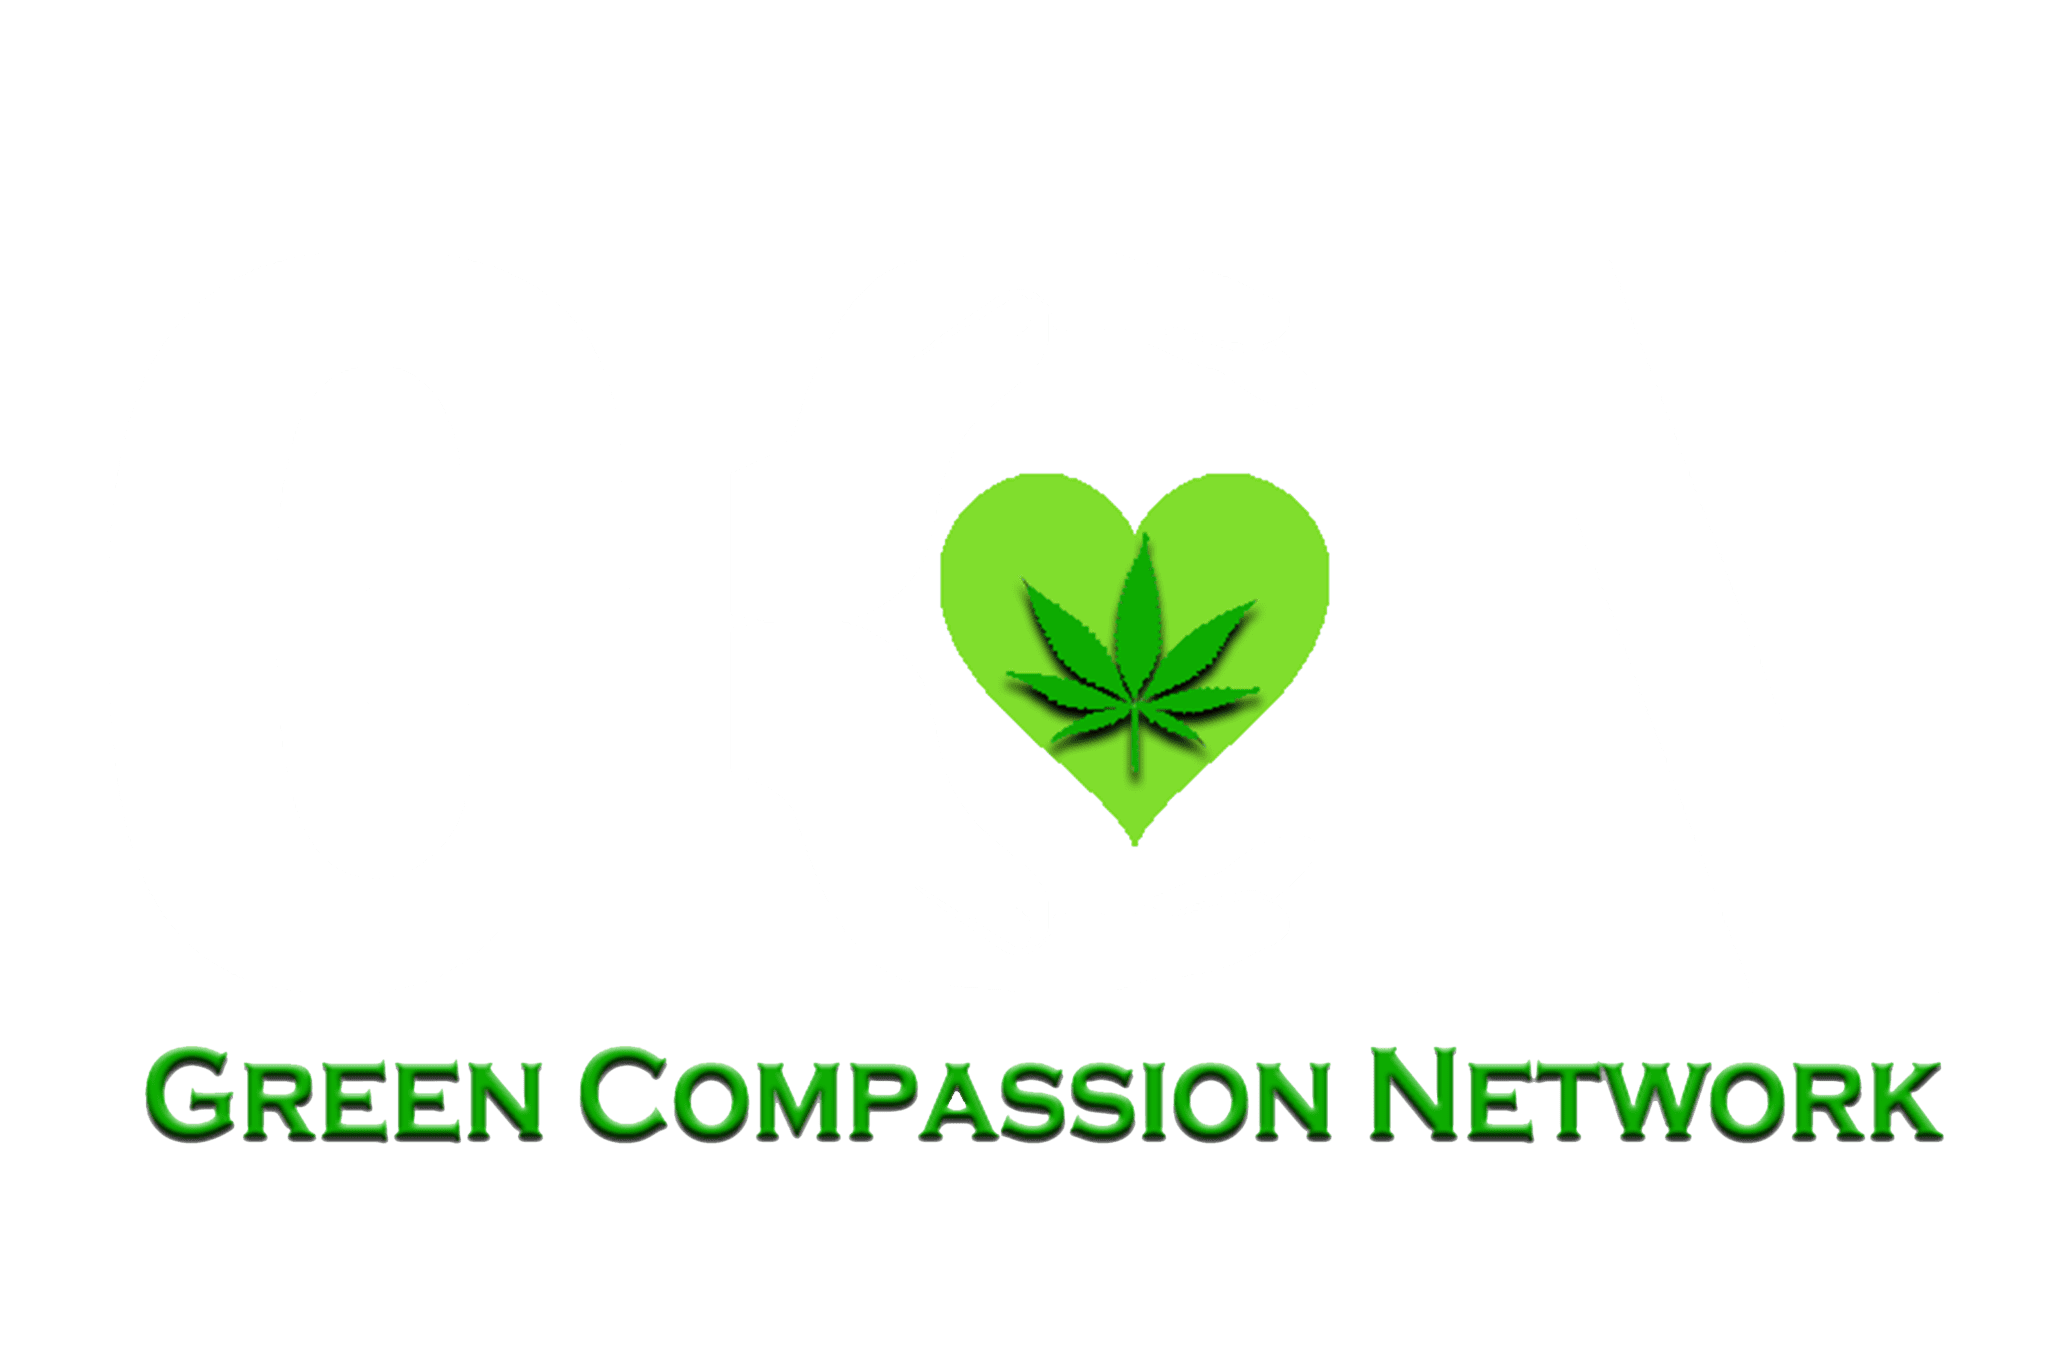 Green Compassion Network